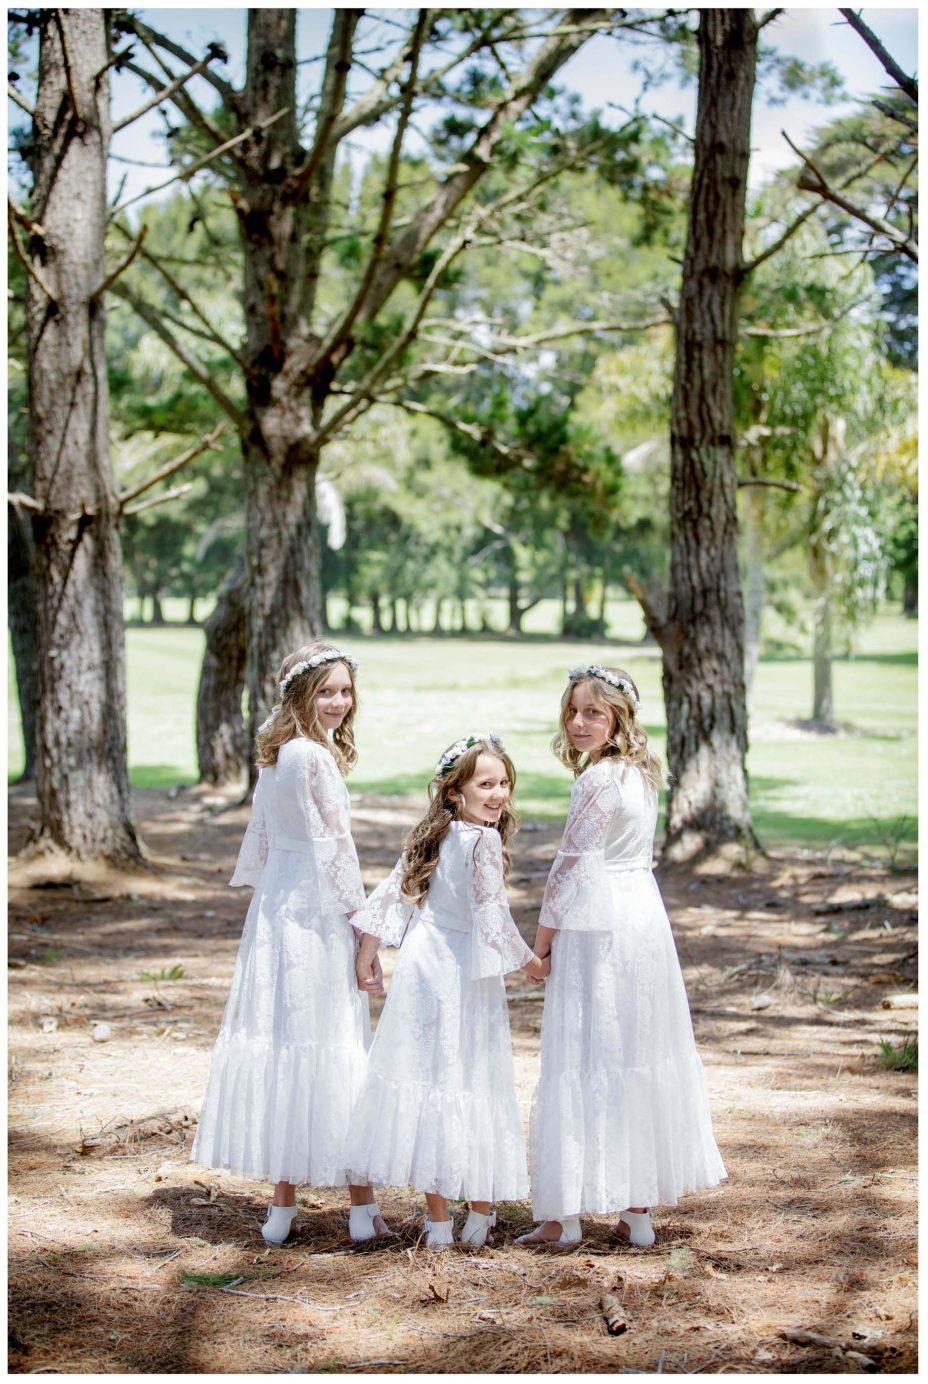 Cute Flower girls in white lace dresses turn to camera smiling, Northridge Estate wedding